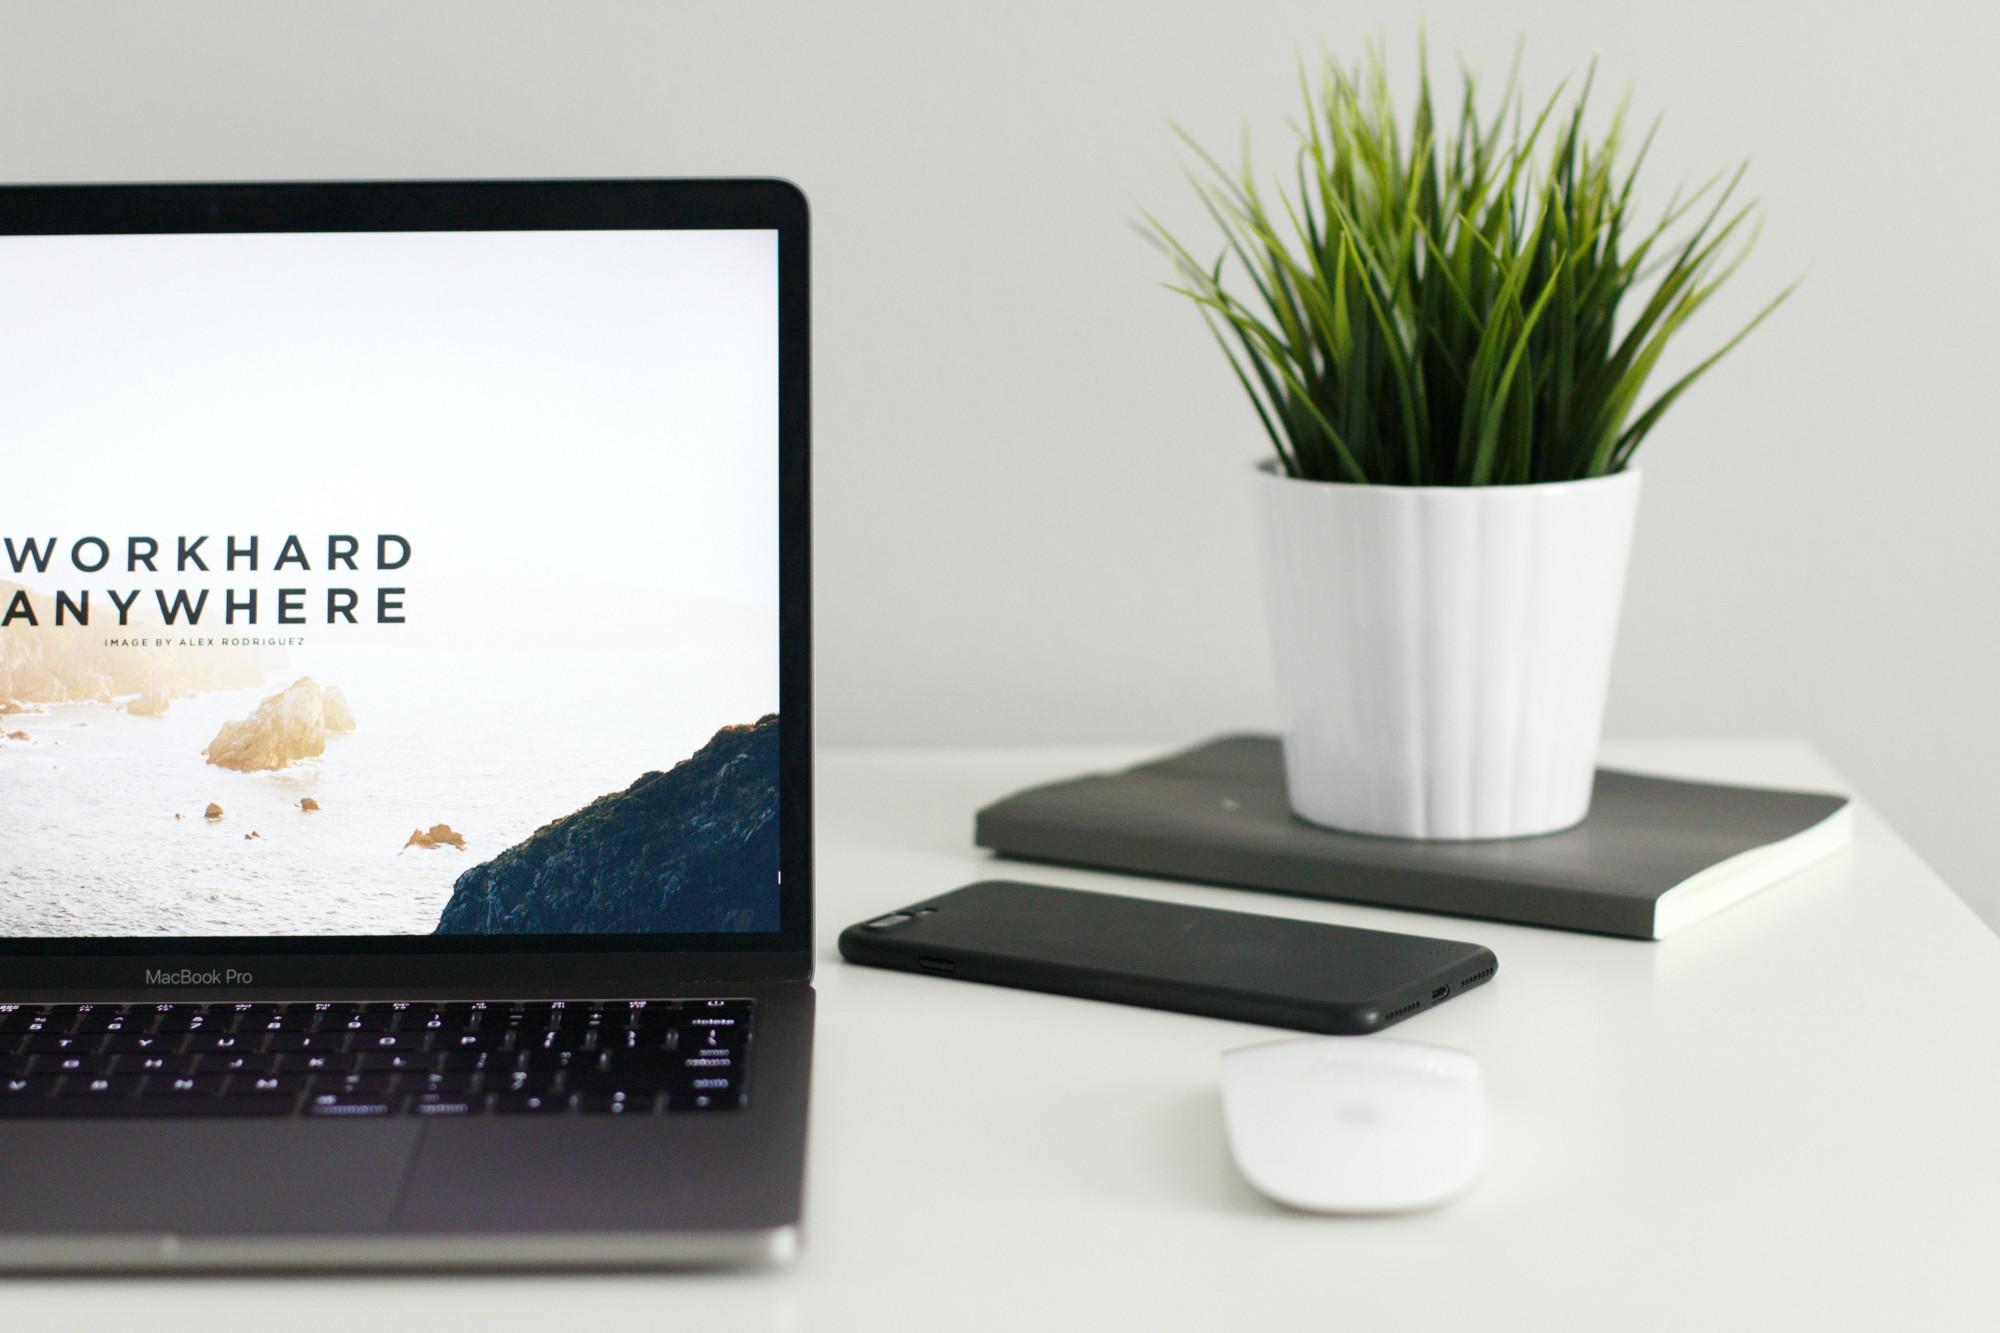 webformix internet service for home wifi